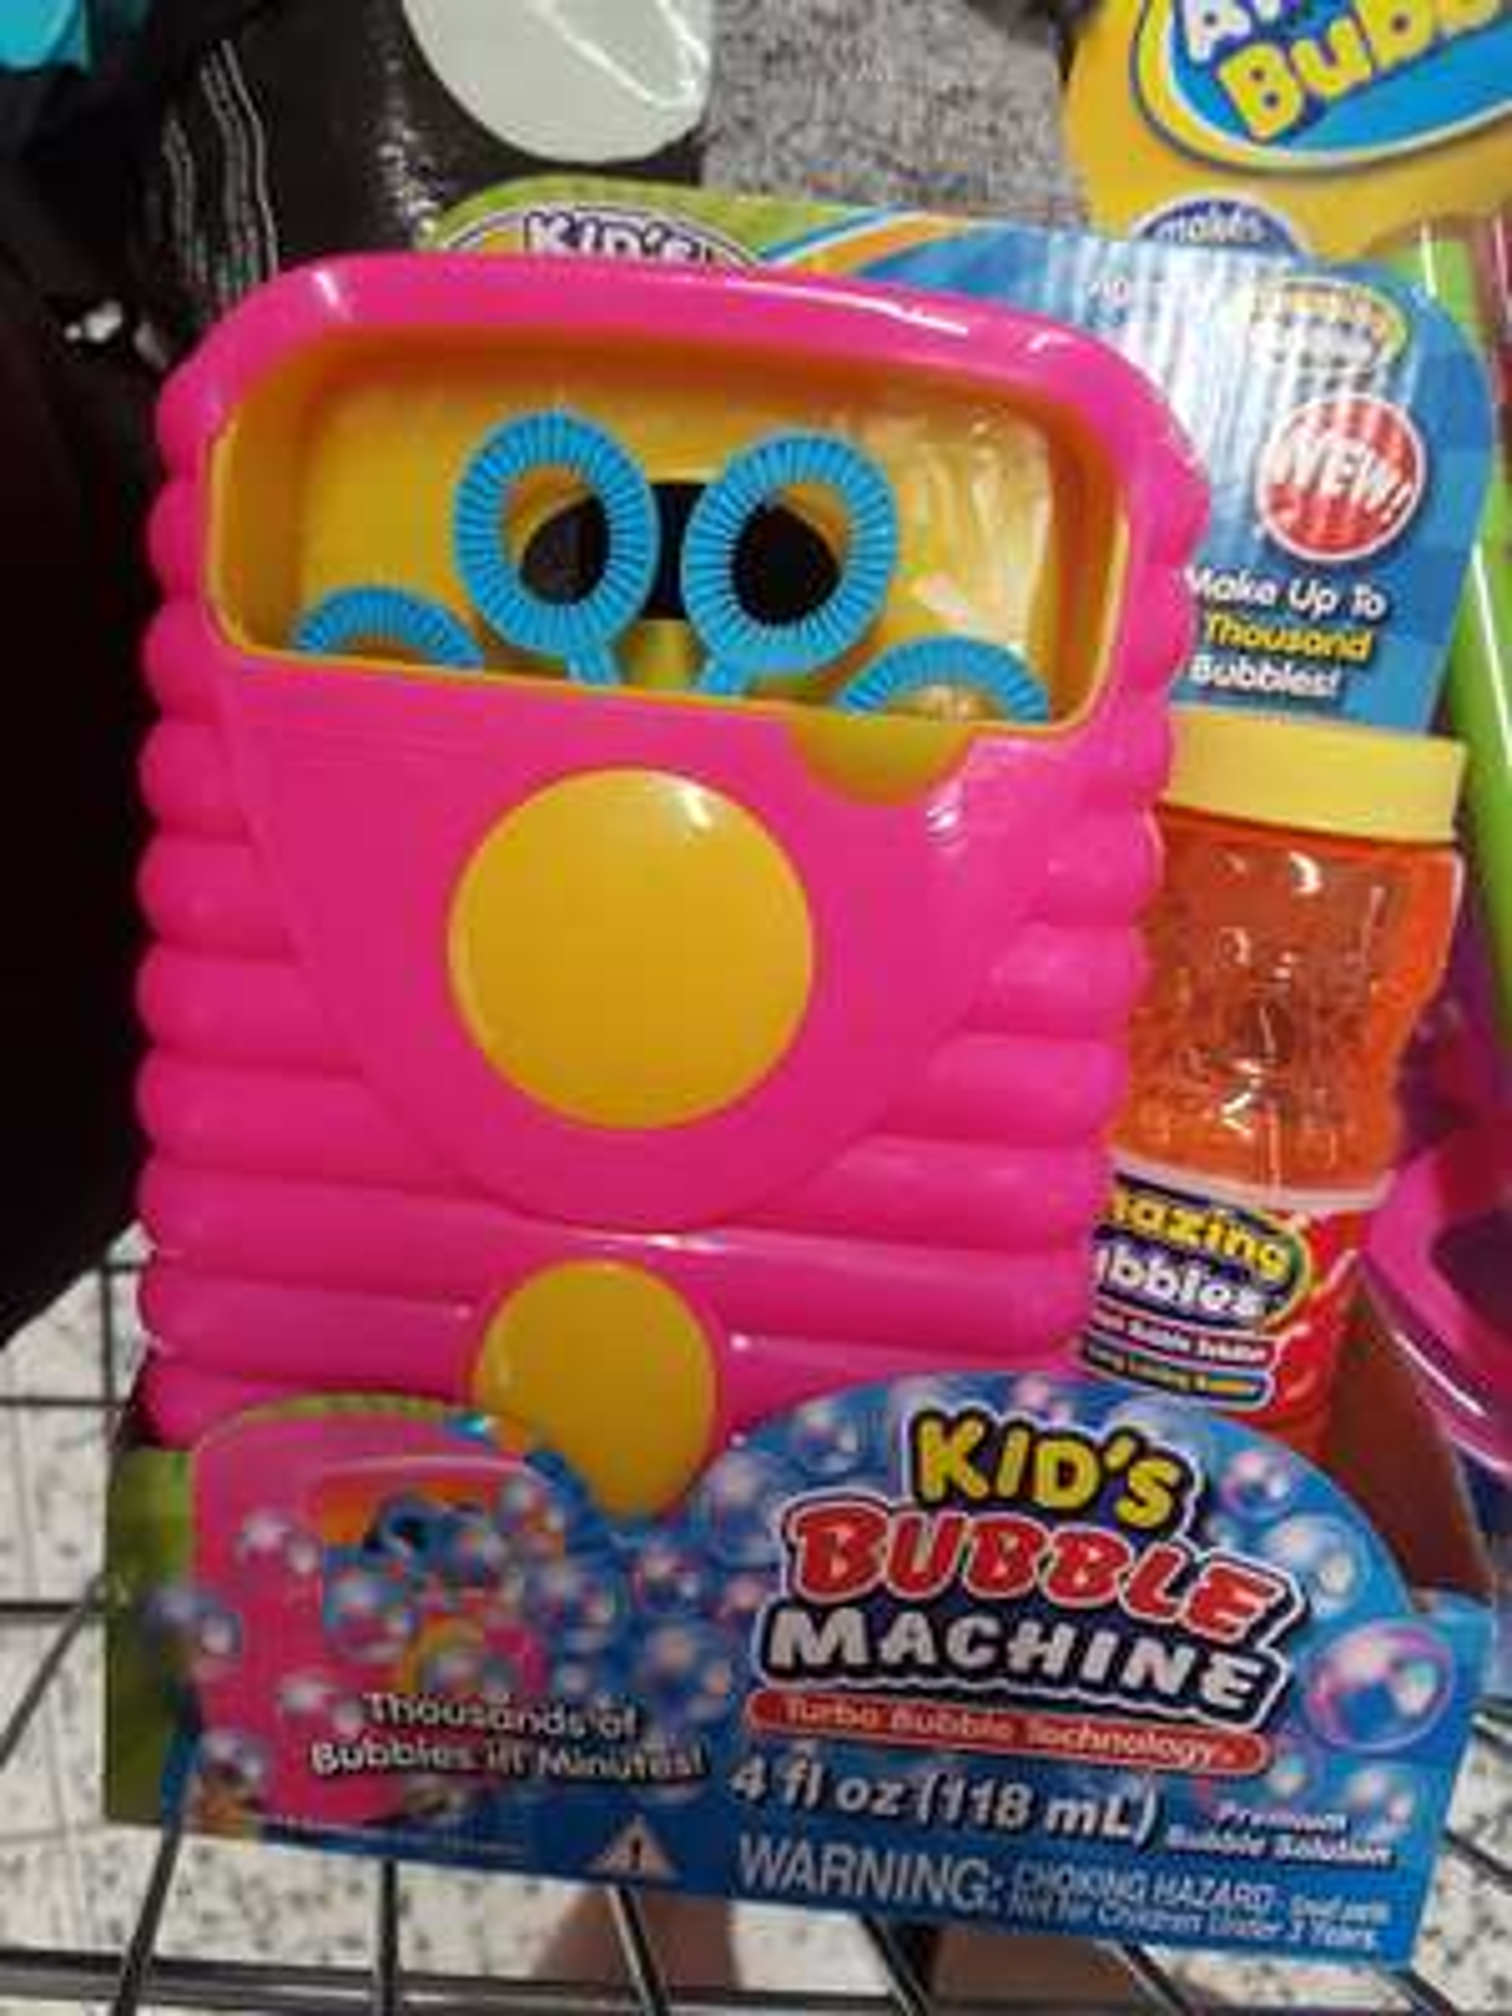 Bubble machine £1.25 / Giant bubble wand 75p at Asda instore